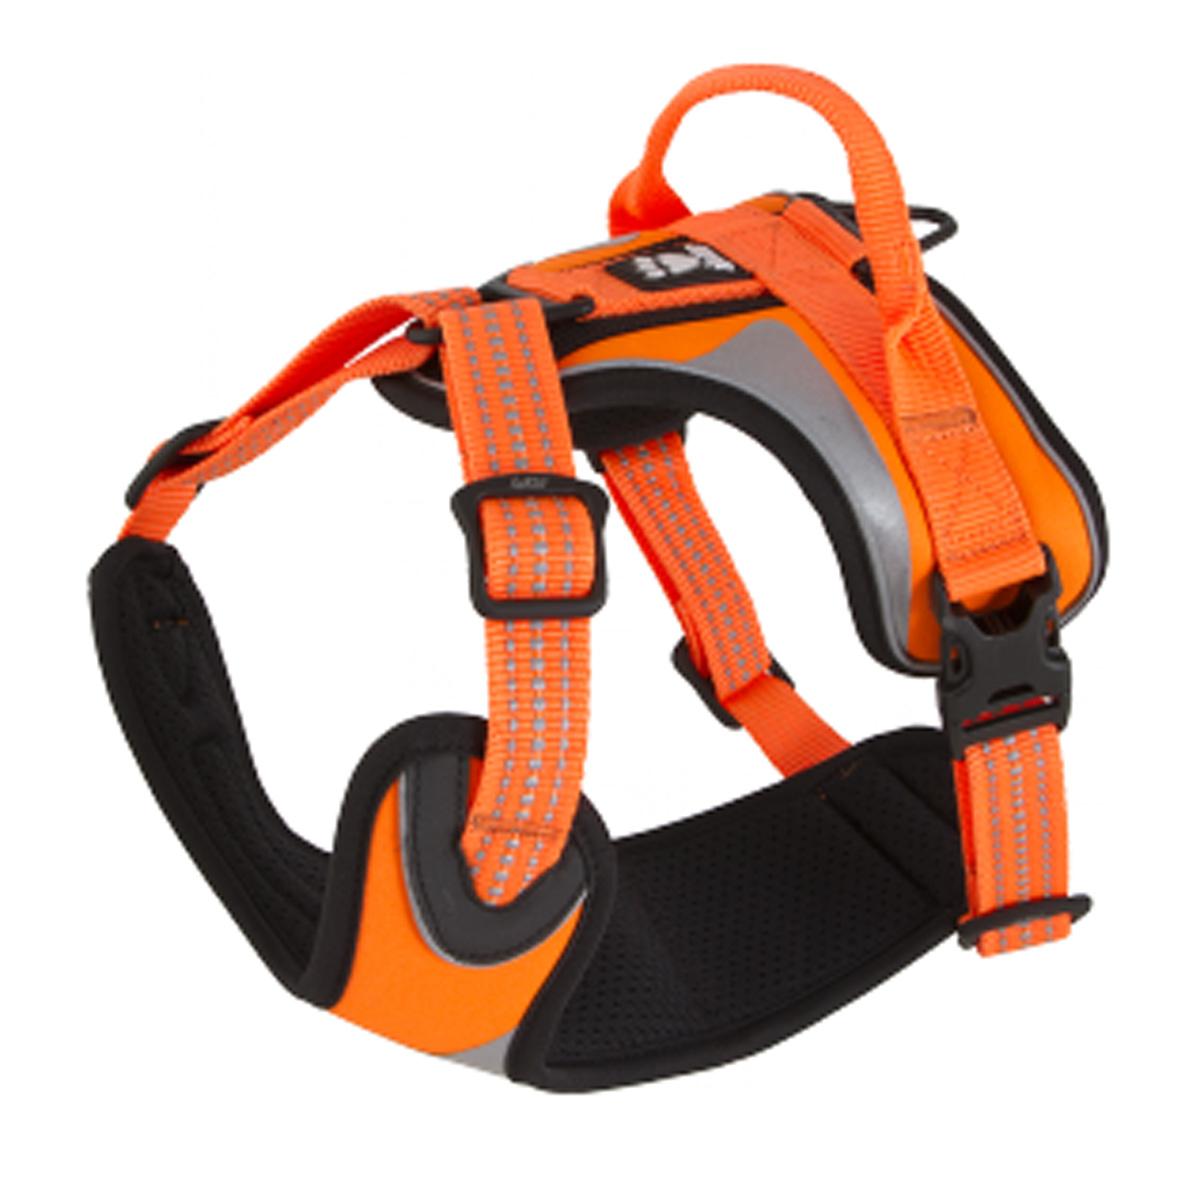 hurtta active dazzle dog harness orange 2833 hurtta active dazzle dog harness orange baxterboo